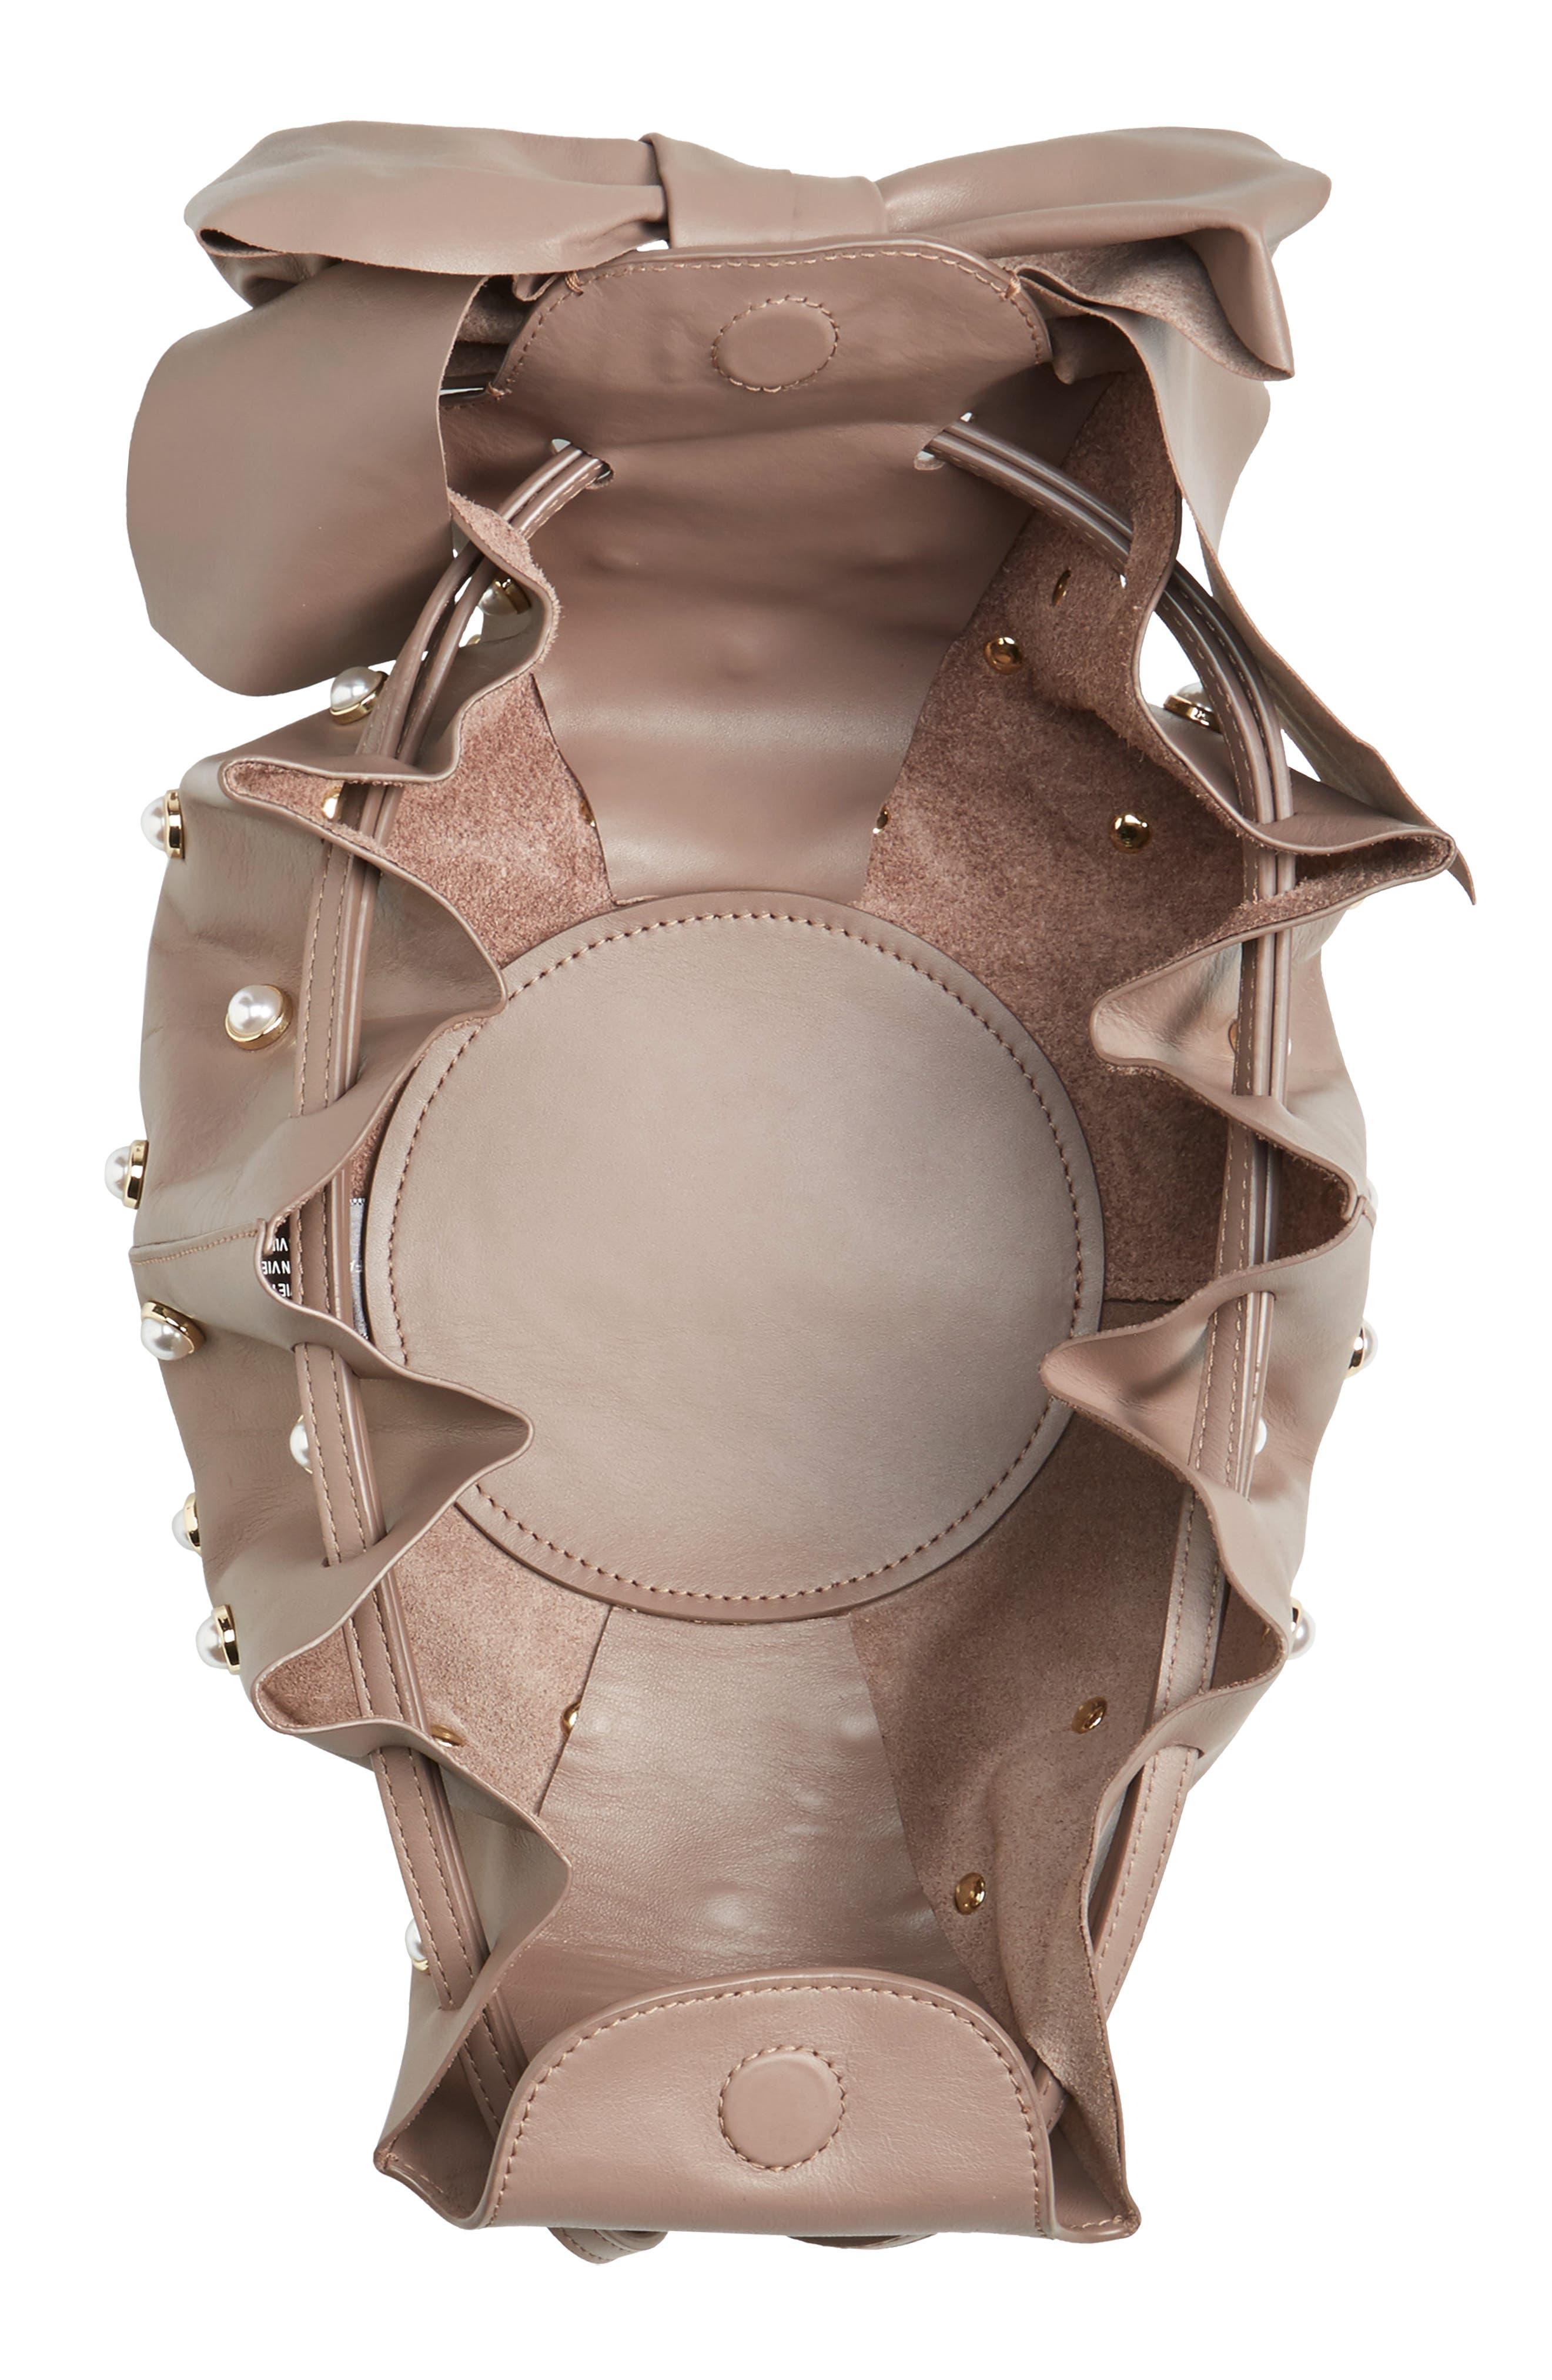 Soirée Imitation Pearl Lady Leather Crossbody Bag,                             Alternate thumbnail 4, color,                             530